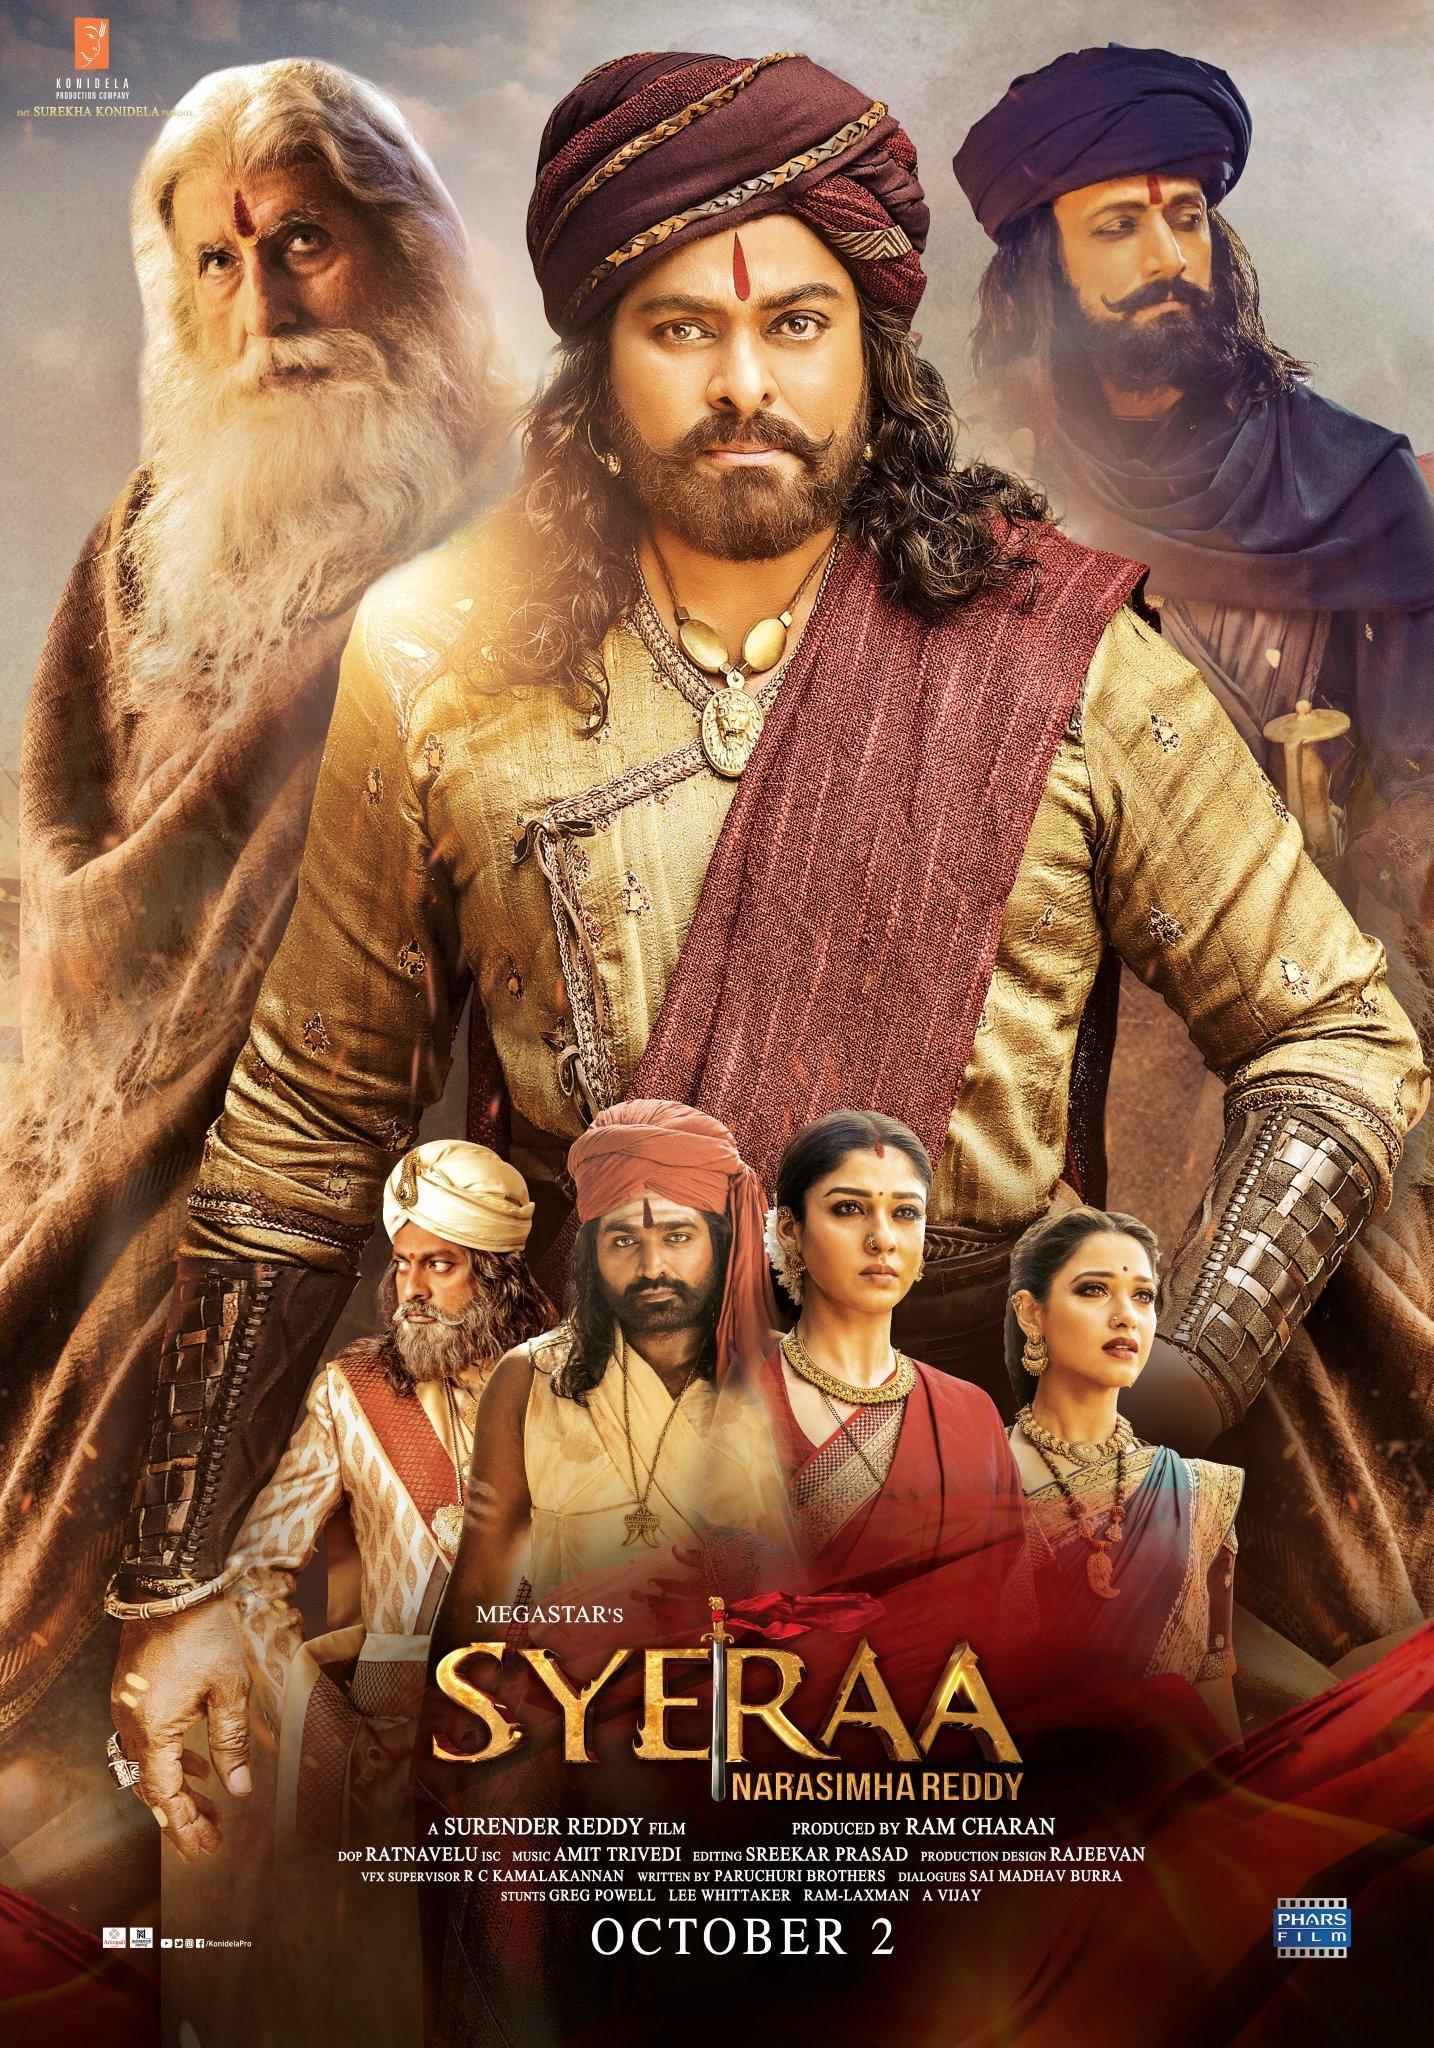 Sye Raa Narasimha Reddy (2019) Telugu  WEB-DL - 480P | 720P | 1080P - x264 - 400MB | 700MB | 2GB | 11GB - Download & Watch Online  Movie Poster - mlsbd